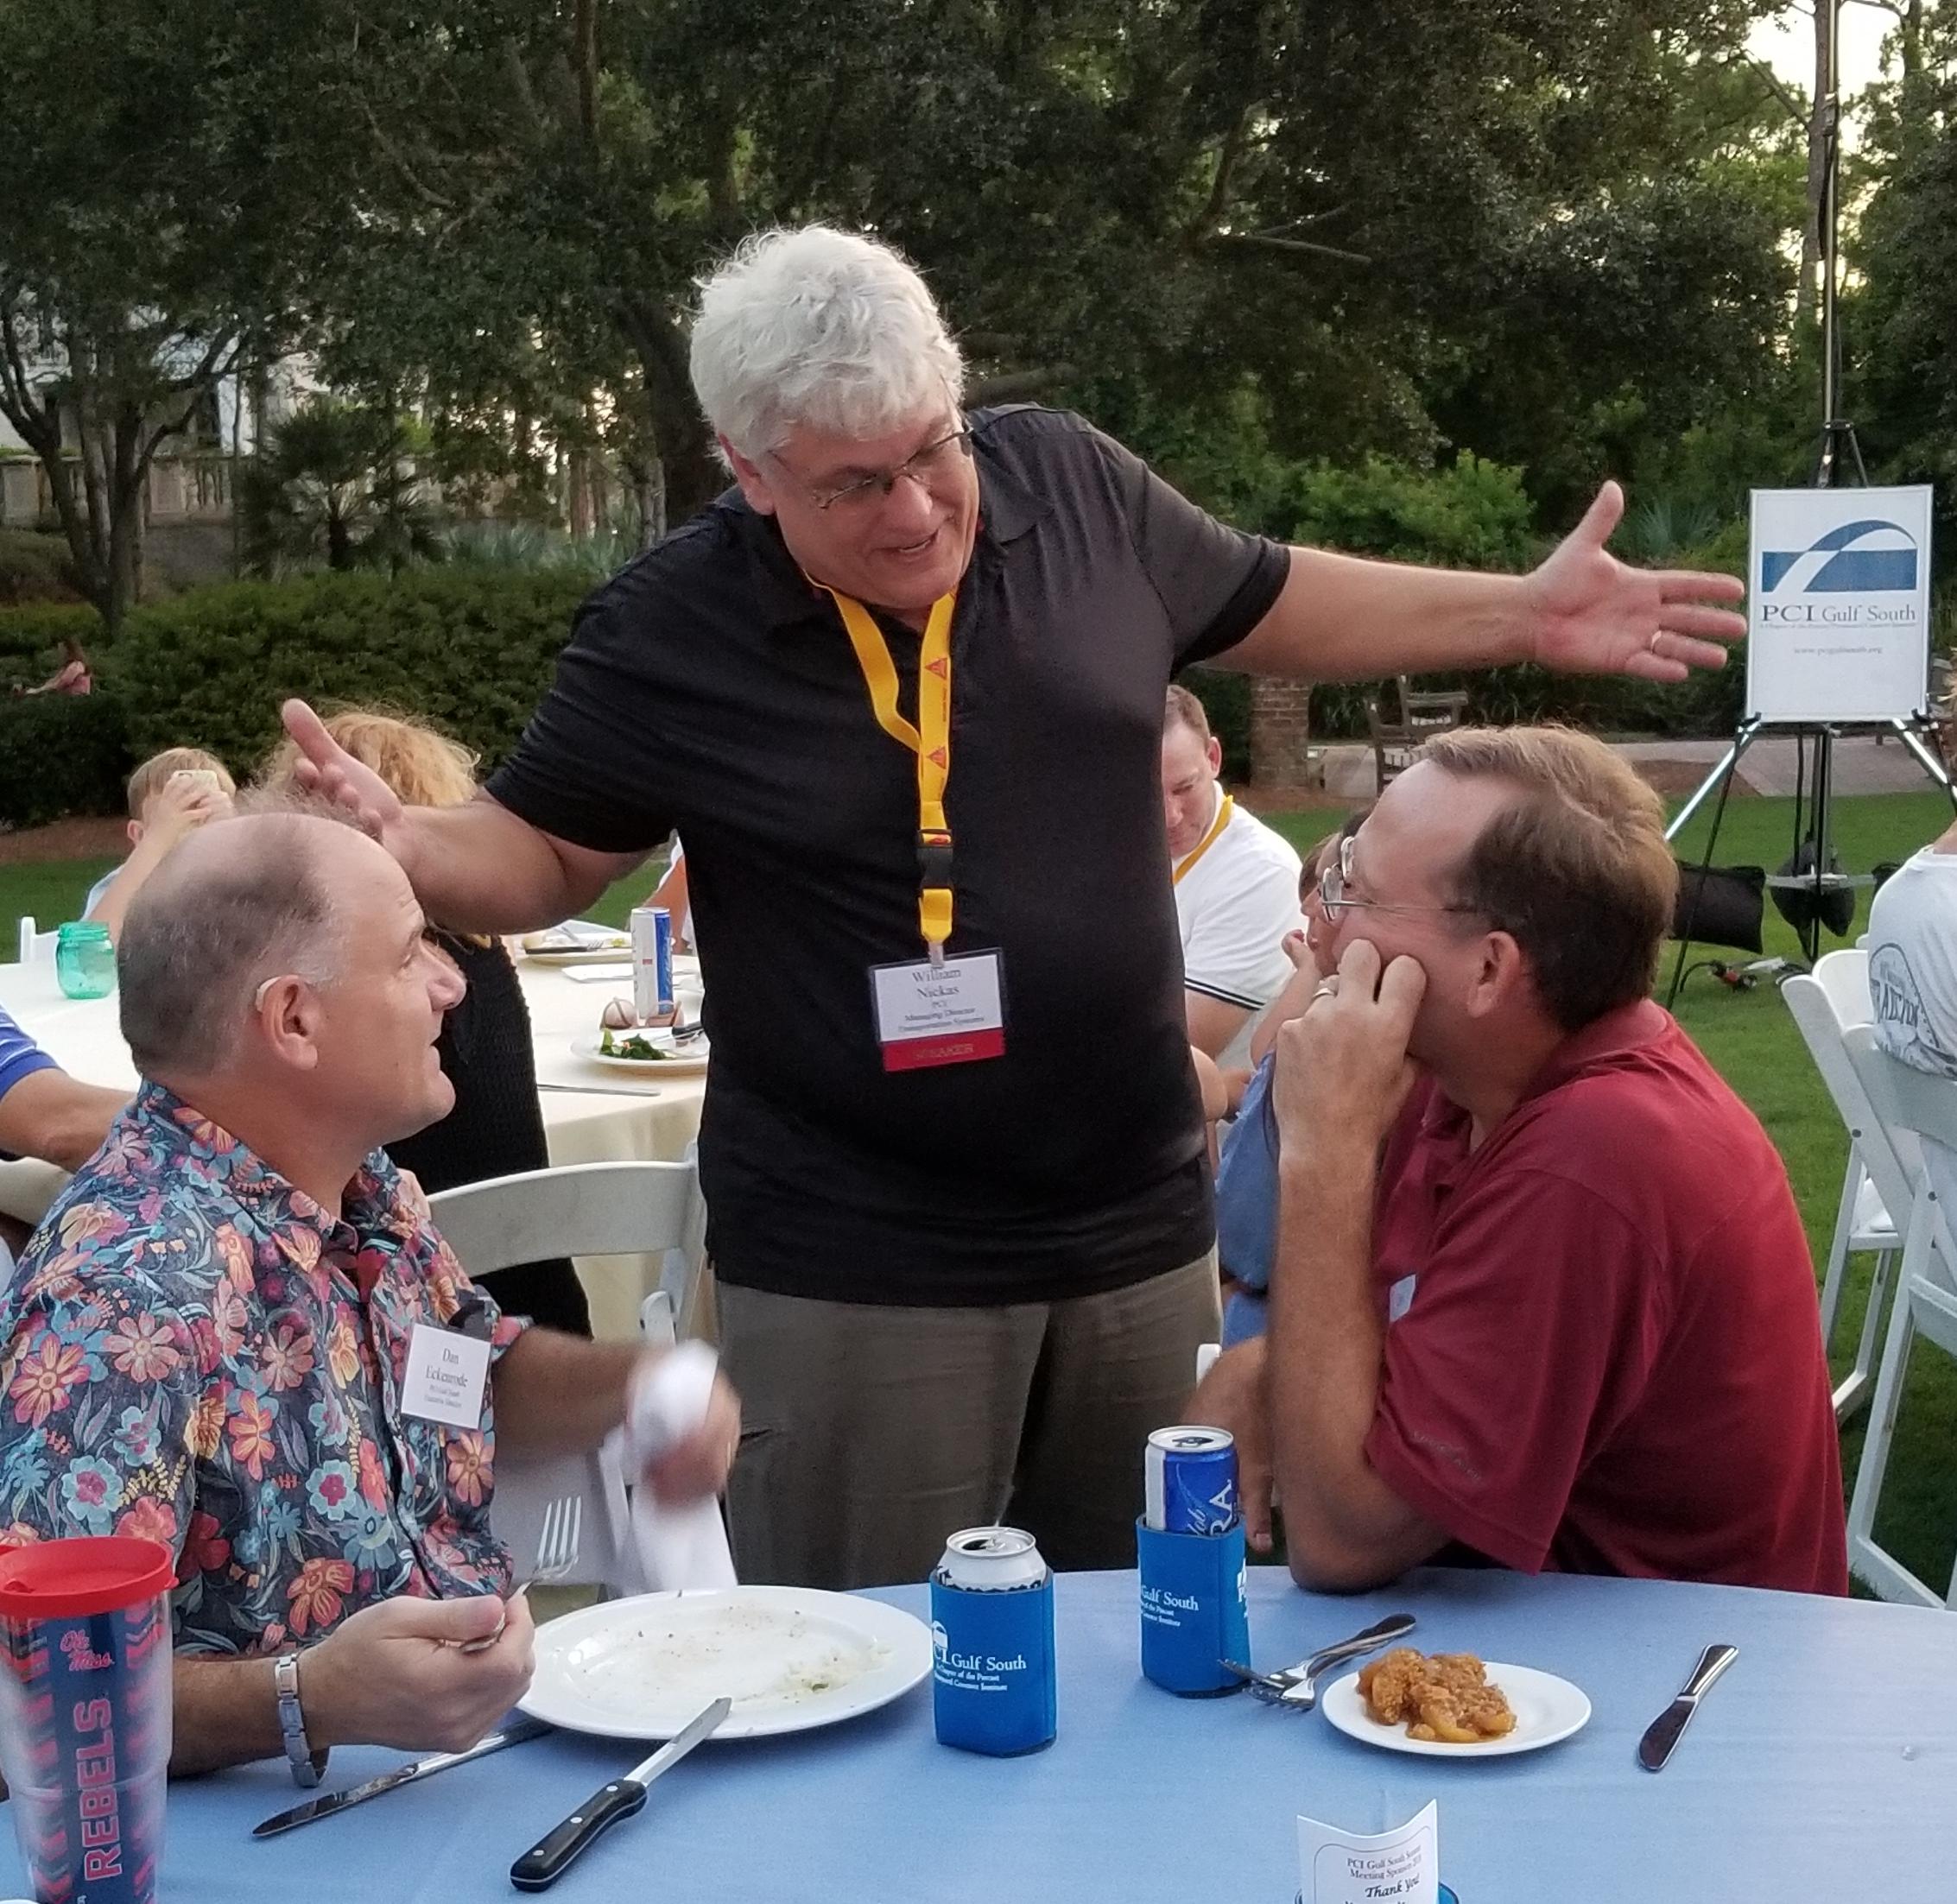 PCI Gulf South 2018 Summer Meeting 25.jpg